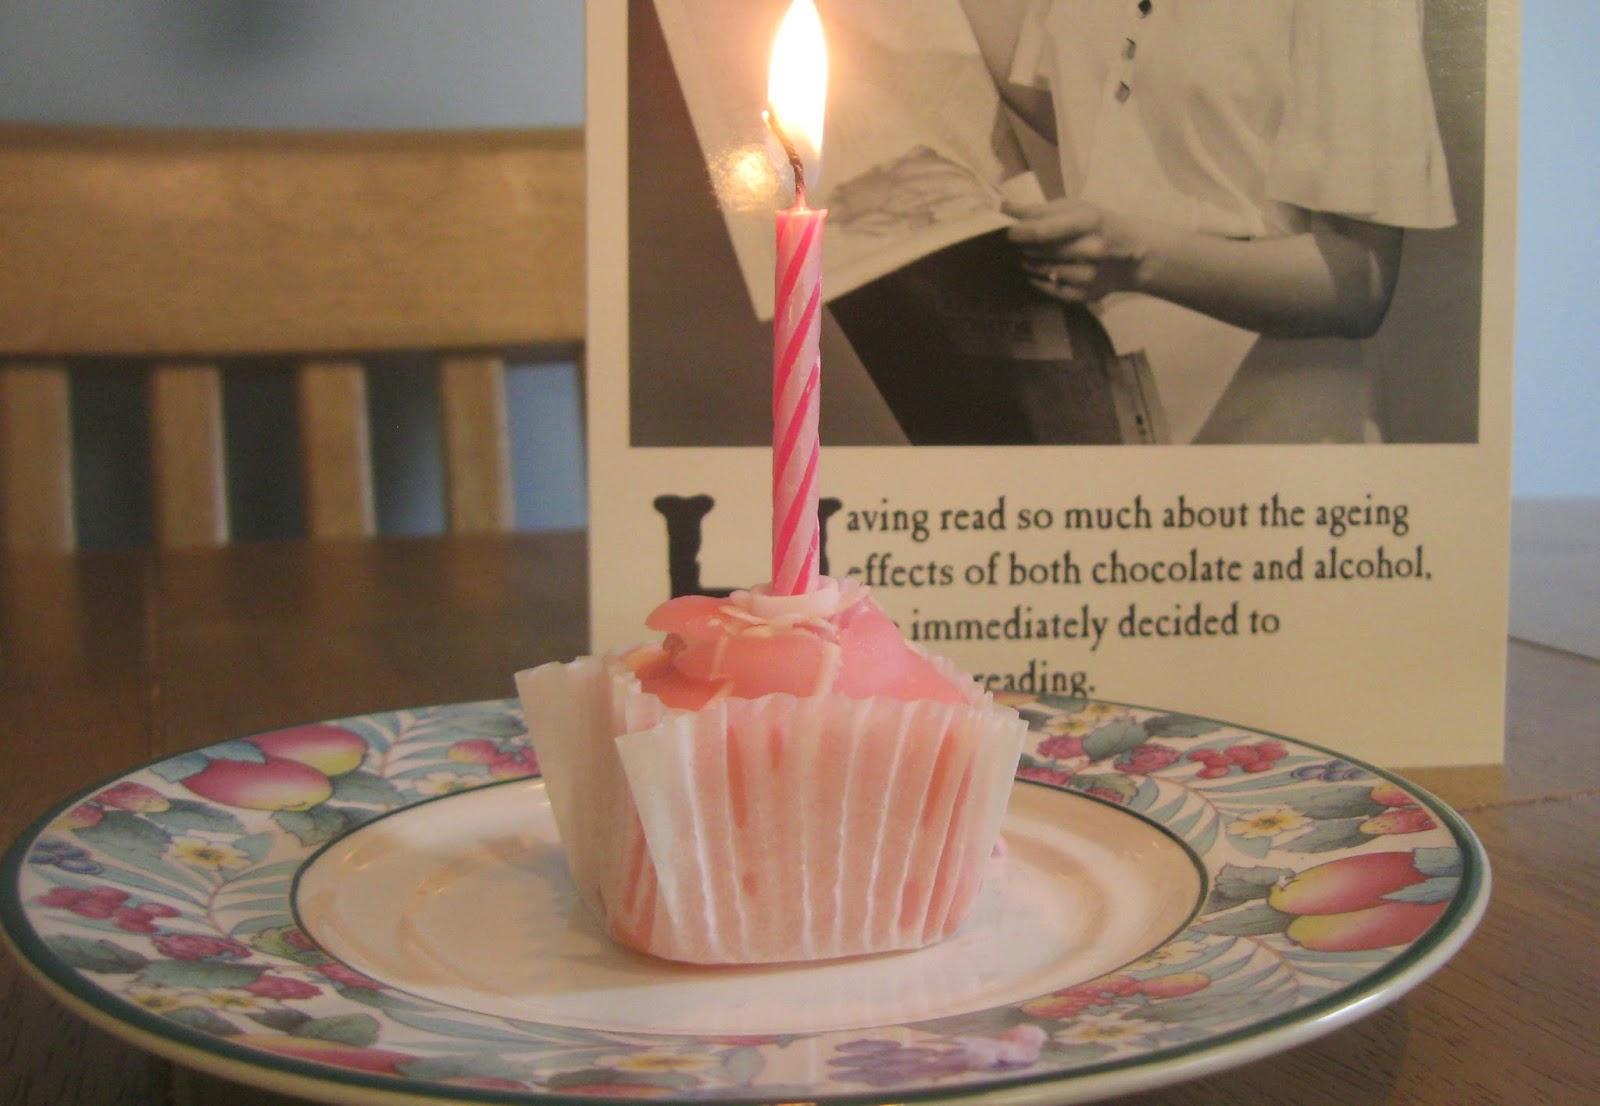 Birthday Cake Vivo Image Inspiration of Cake and Birthday Decoration